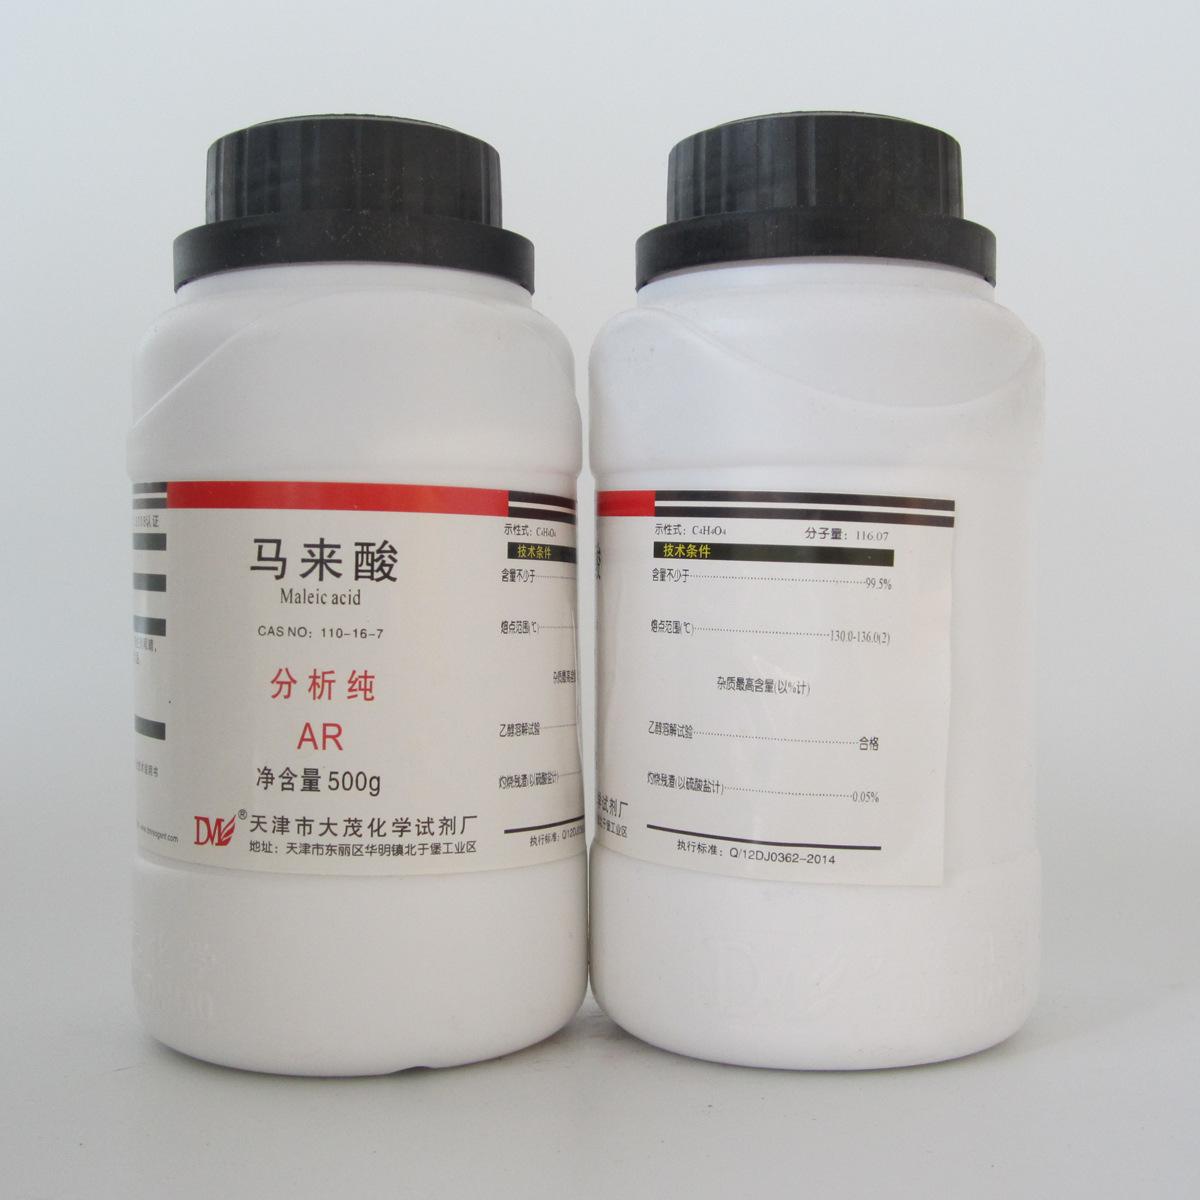 Axit Cacboxylic Thuốc thử phân tích axit maleic axit maleic RA 500g CAS 110-16-7